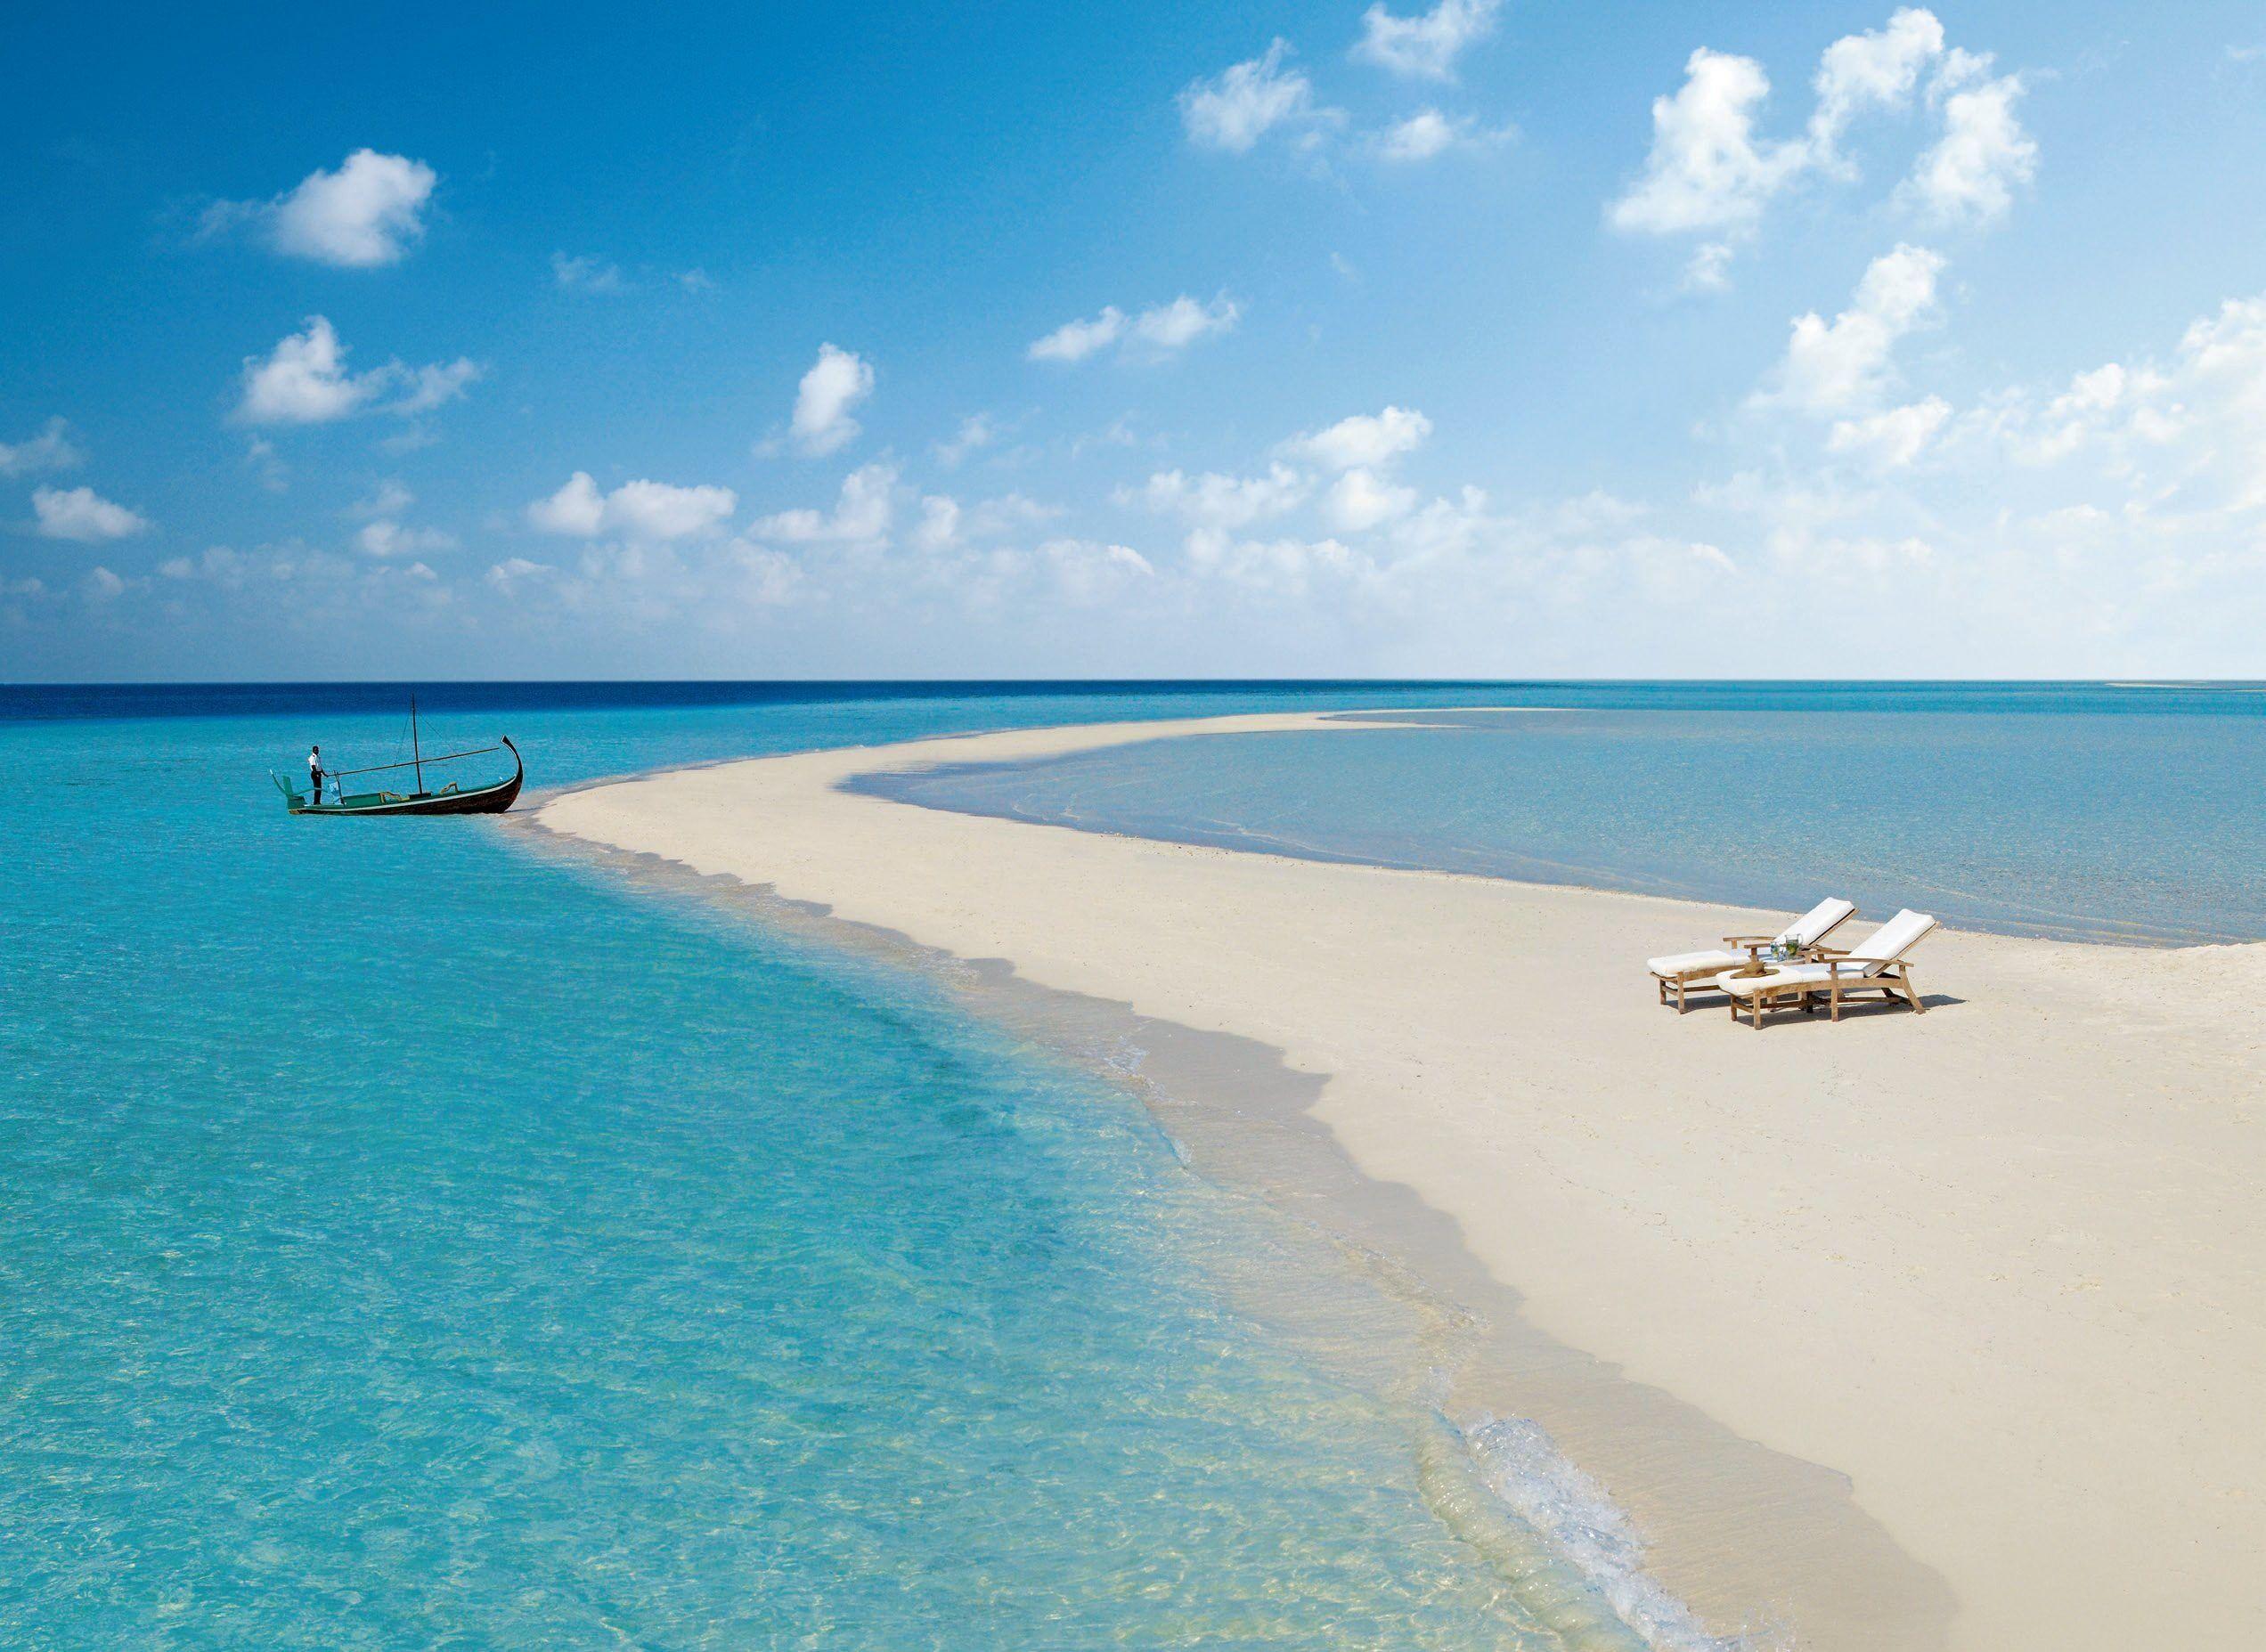 Maldives Beach Maldives Sky Ocean Sea Beach Sand Xhosa Boat Sun Lounger 1080p Wallpaper Hdwallpaper Desktop Maldives Beach Beach Sand Island